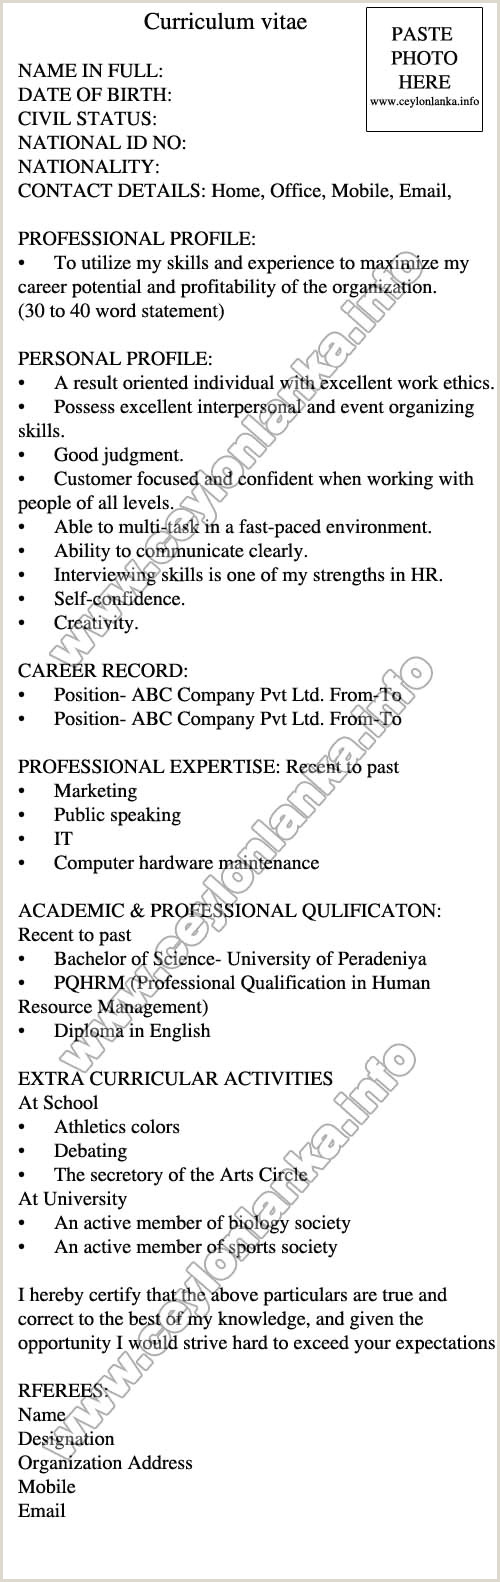 Cv format for Job Application Sri Lanka by Congress Latest Cv format for Job Application In